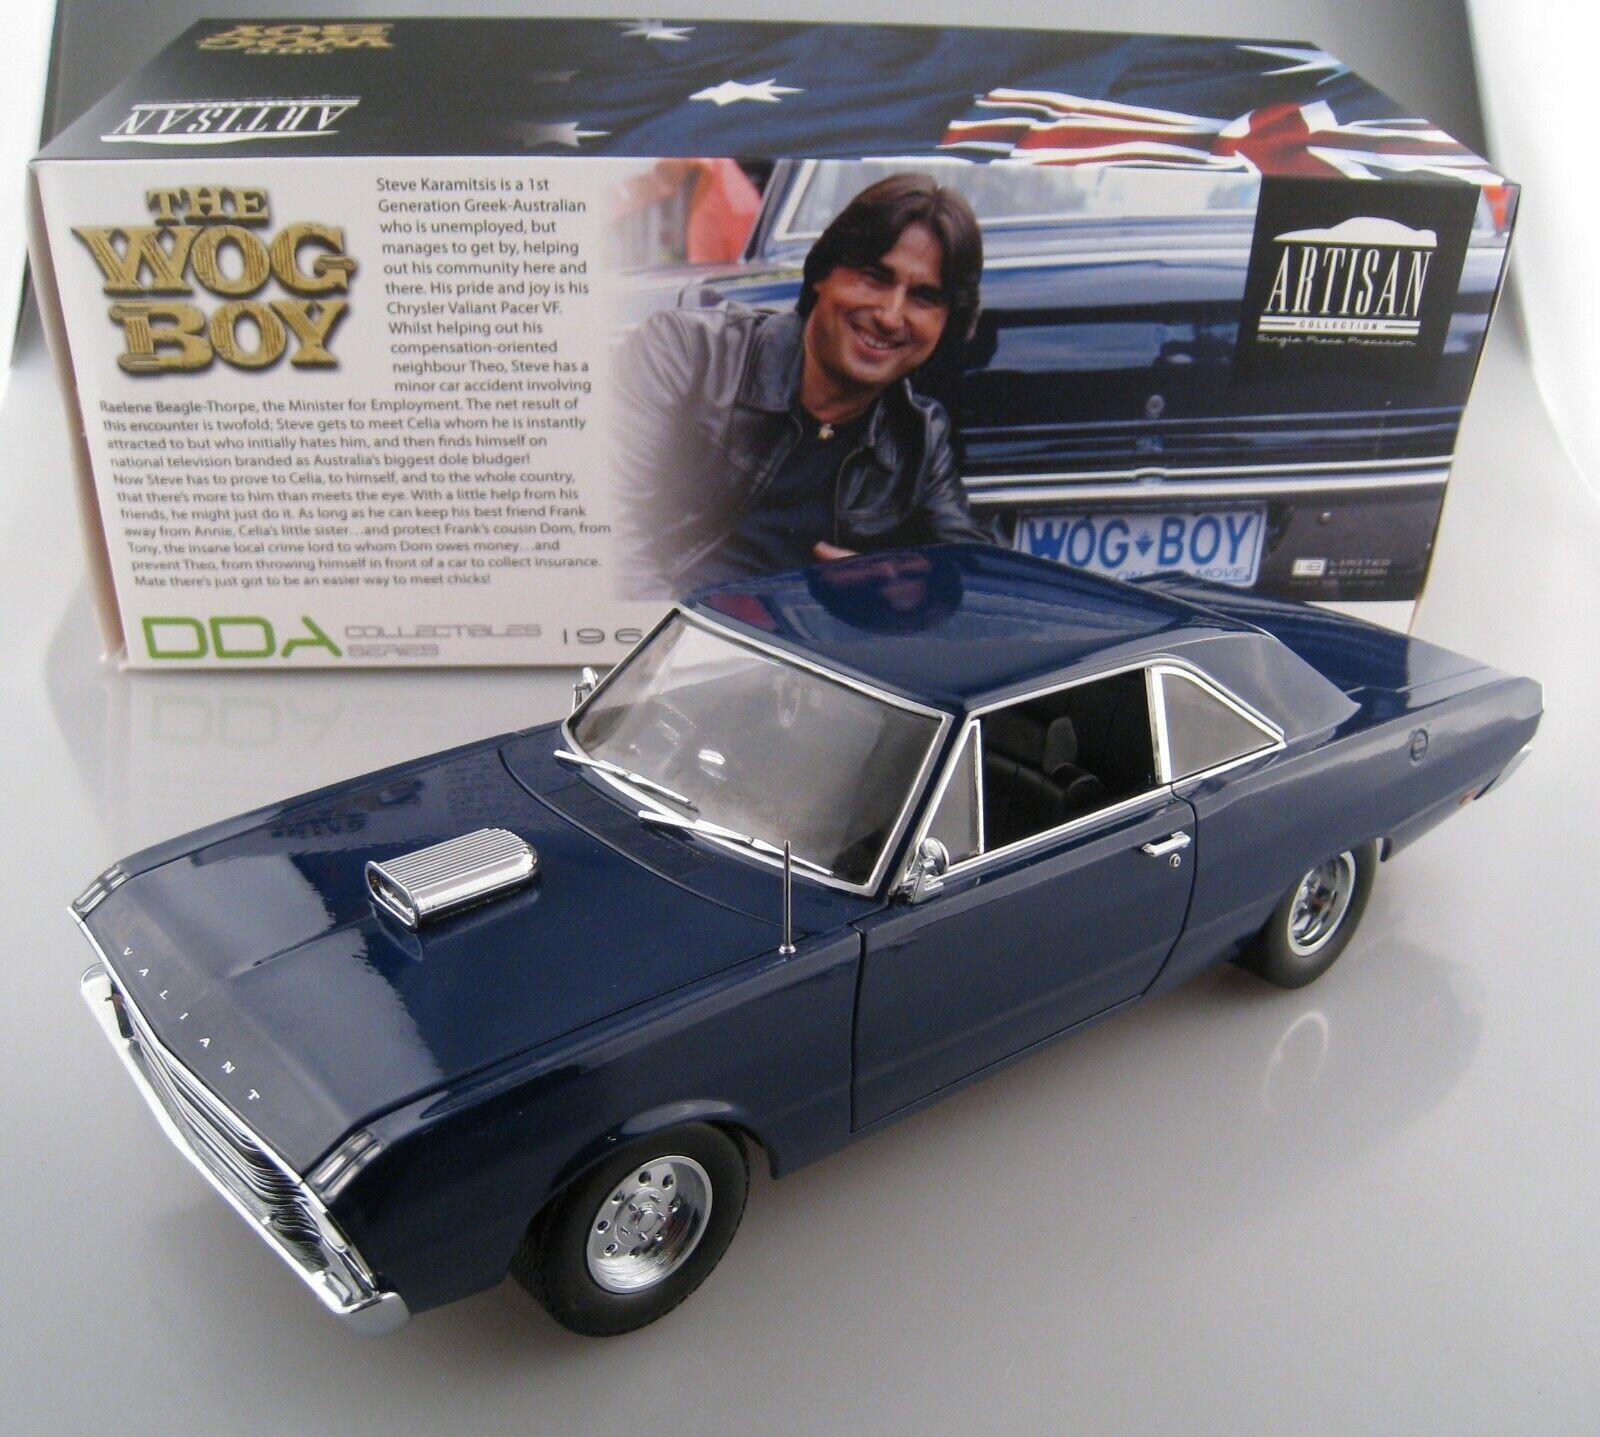 CHRYSLER Valiant VF the WOG Boy Blau 1969 Grünlight 1 18 New Limited